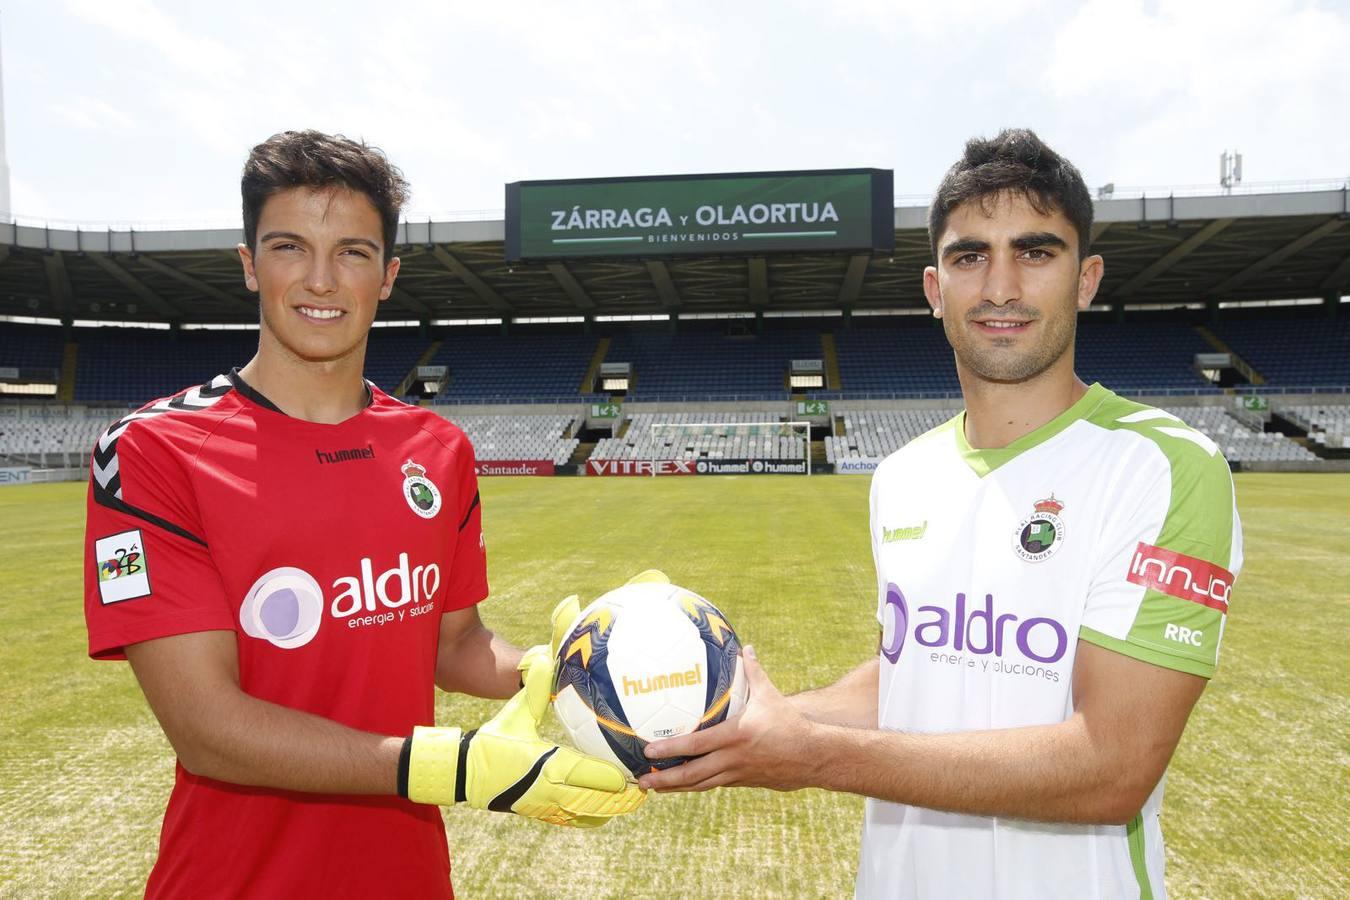 El Racing presenta a sus dos primeros fichajes, Jagoba Zárraga e Iñaki Olaortua